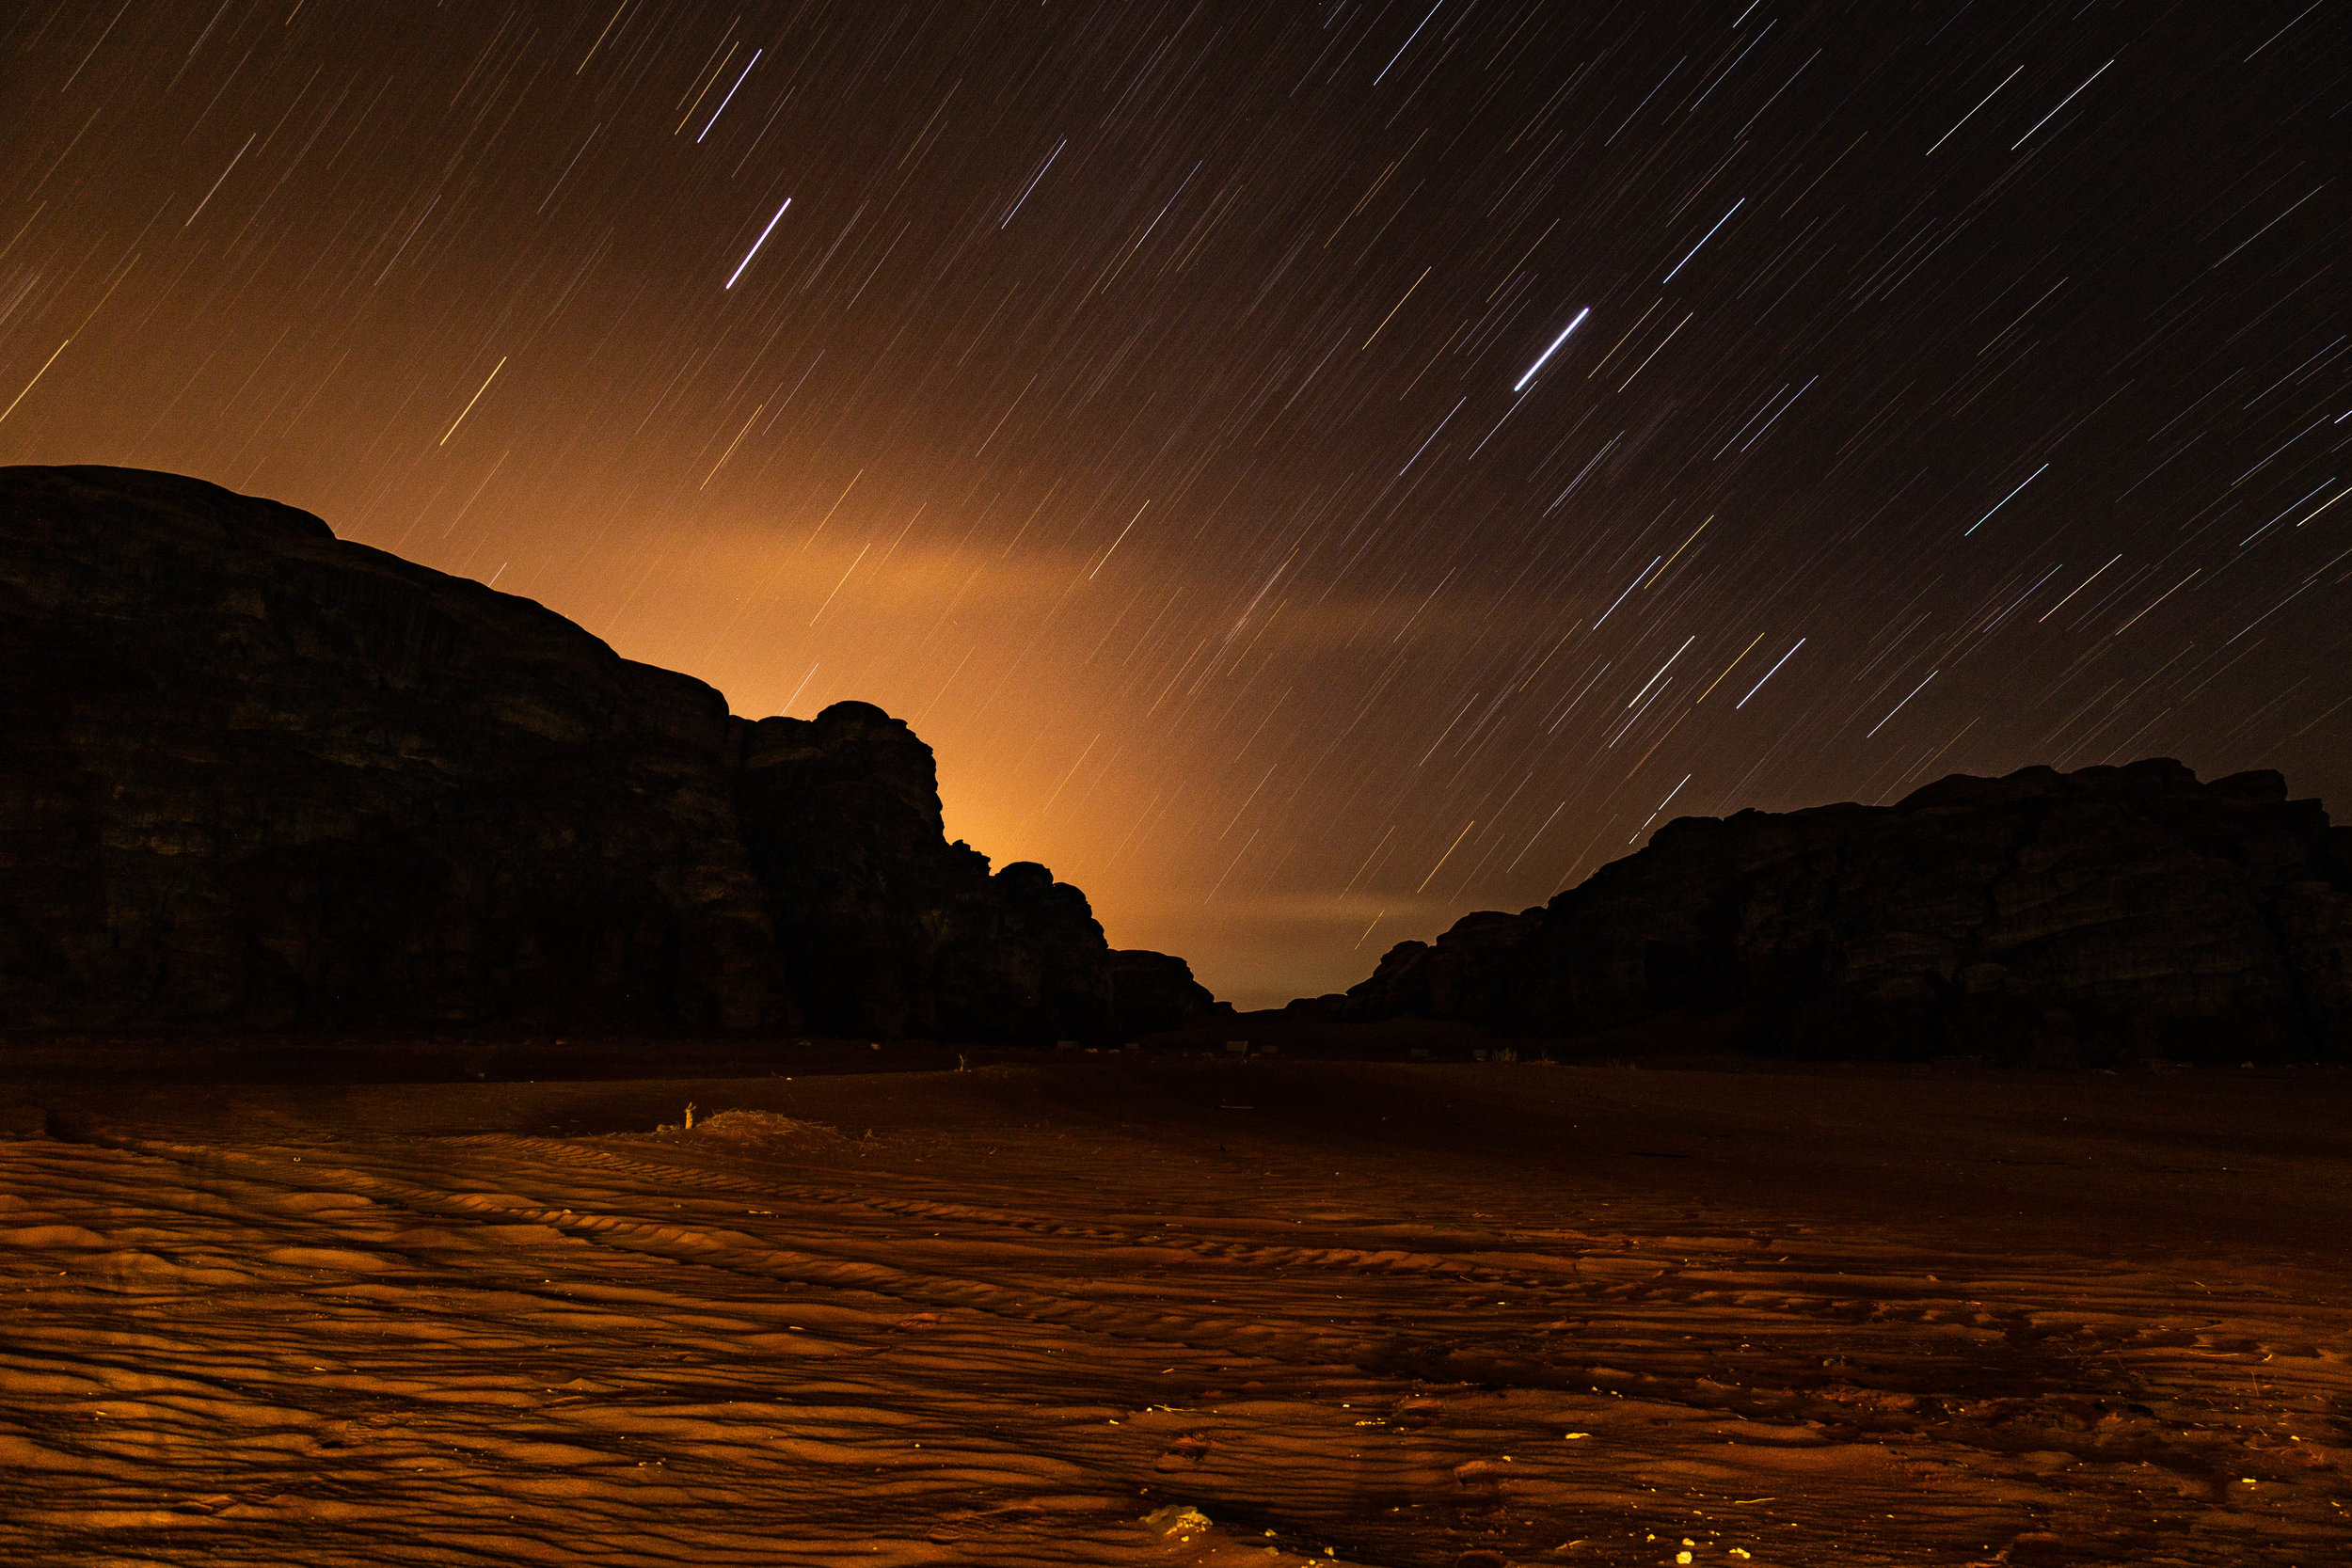 Wadi Rum star trails